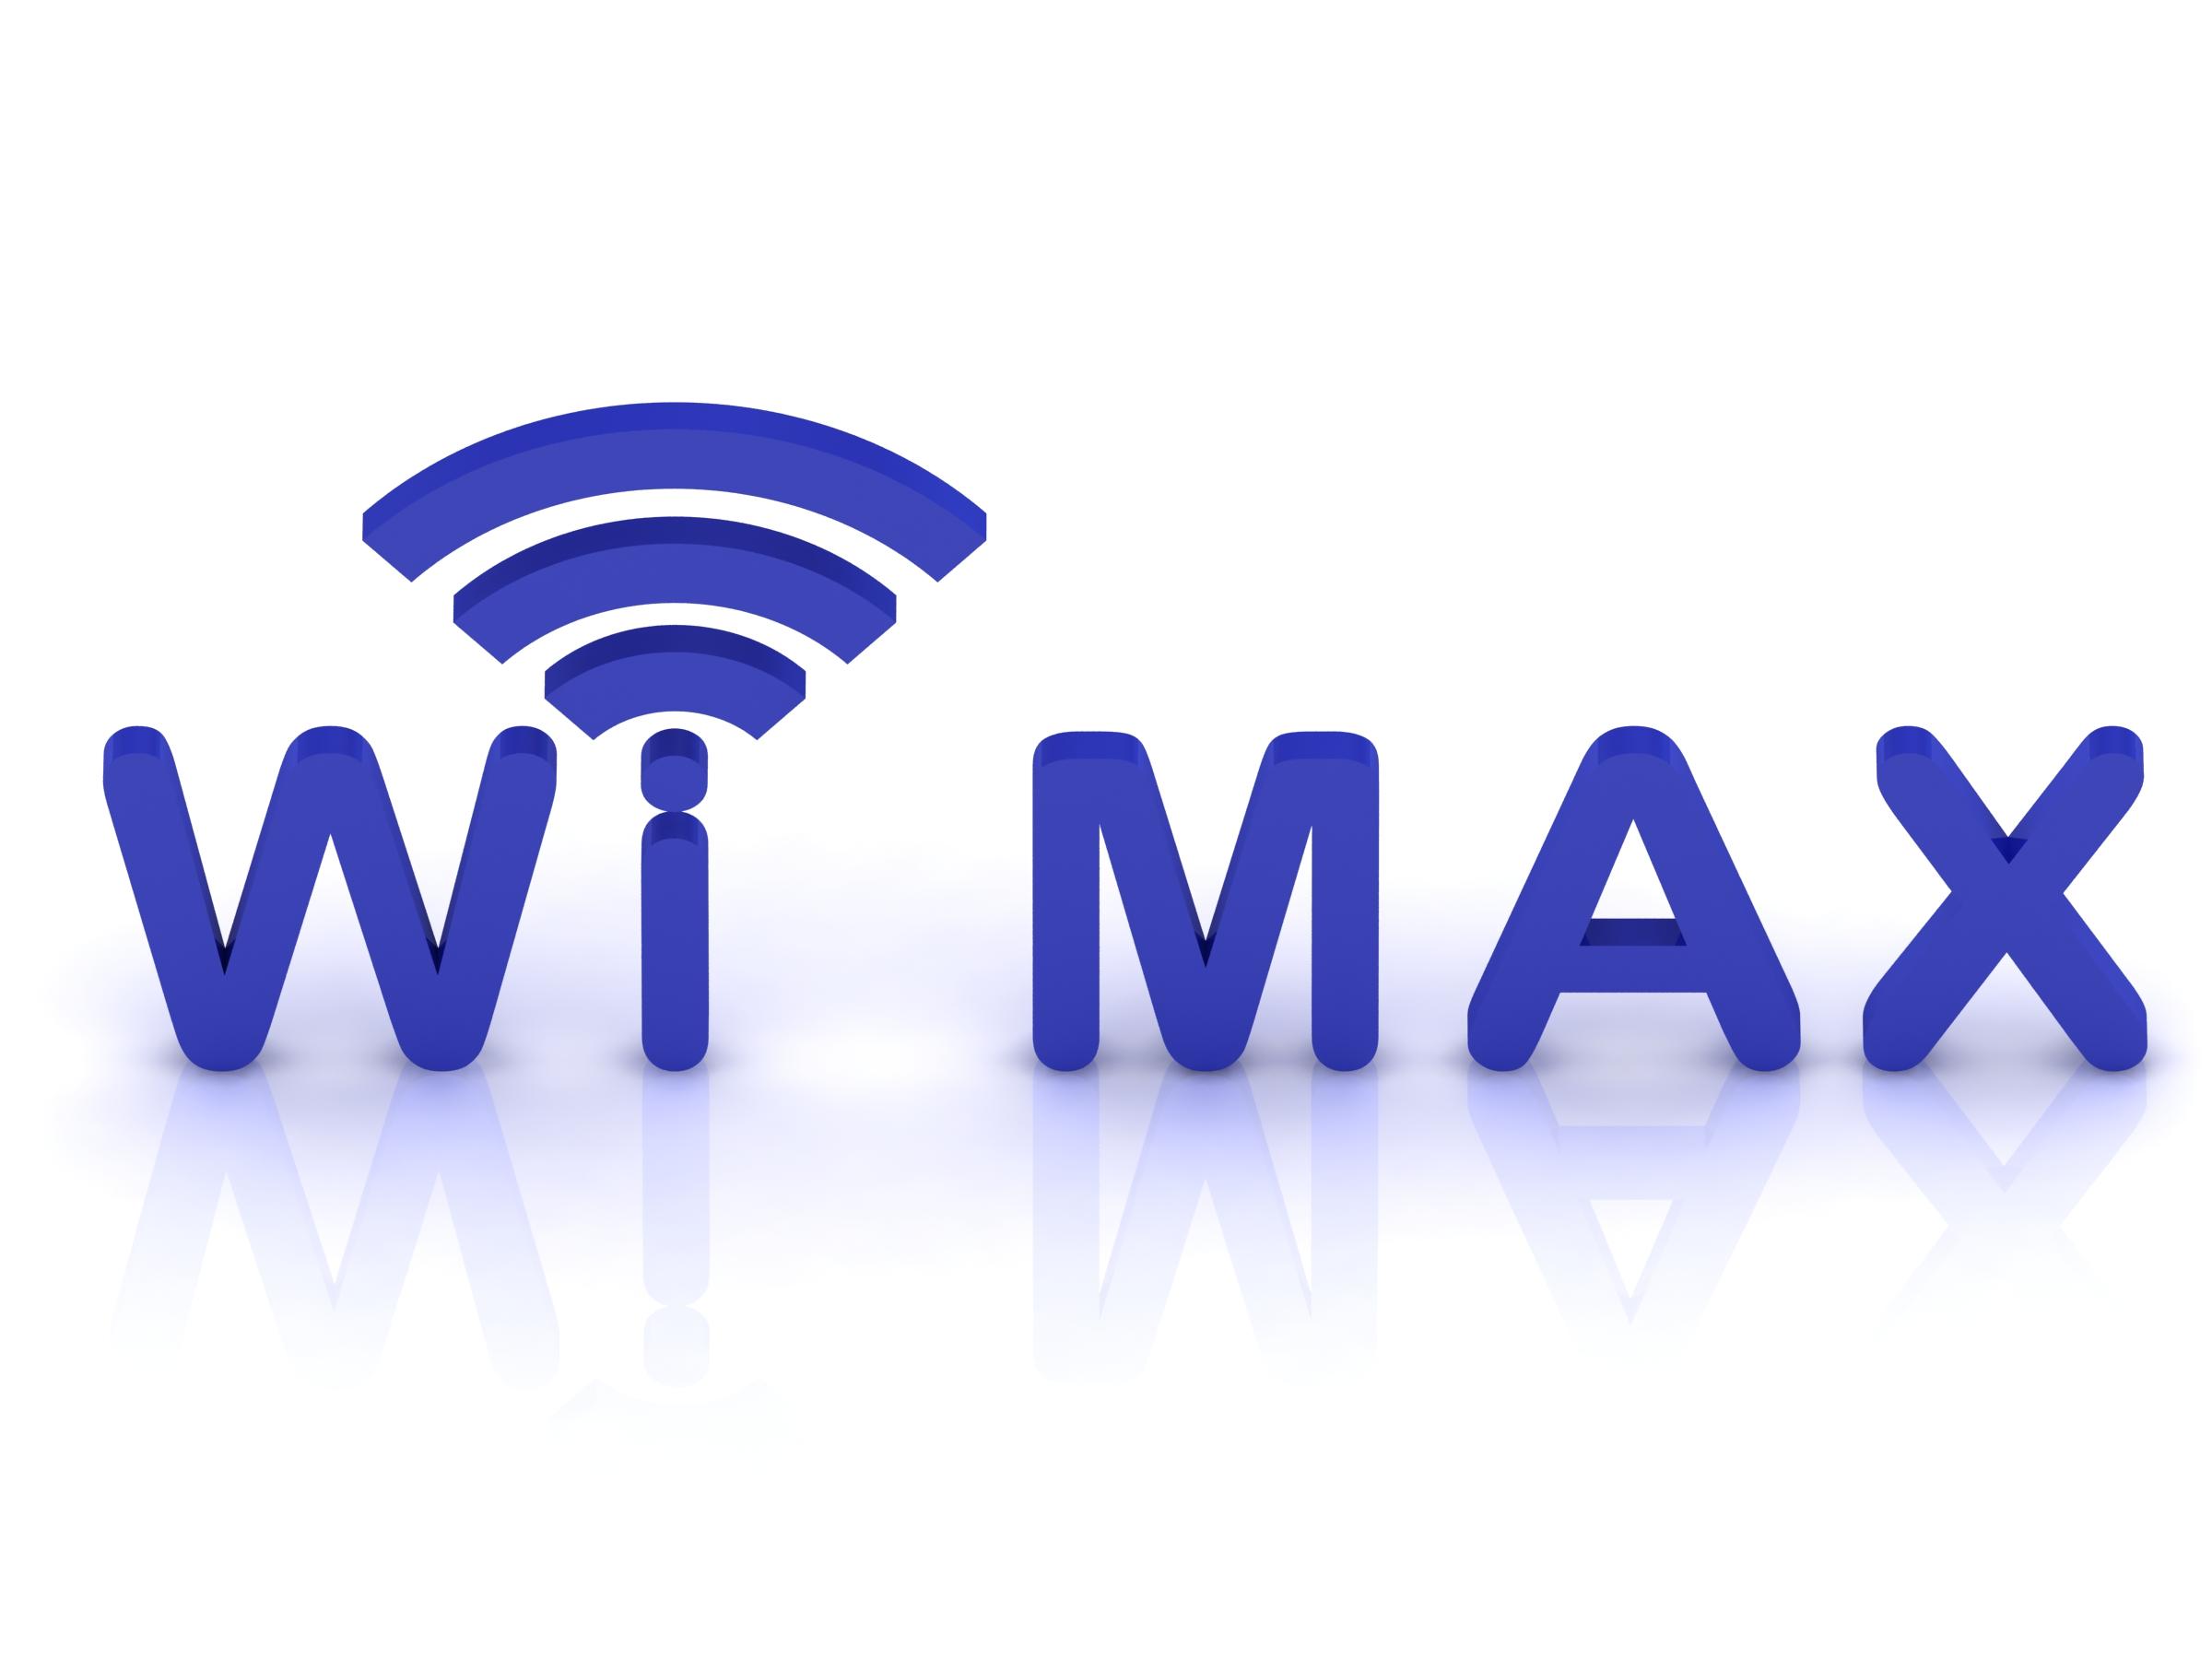 Wi MAX logo, 3D render image